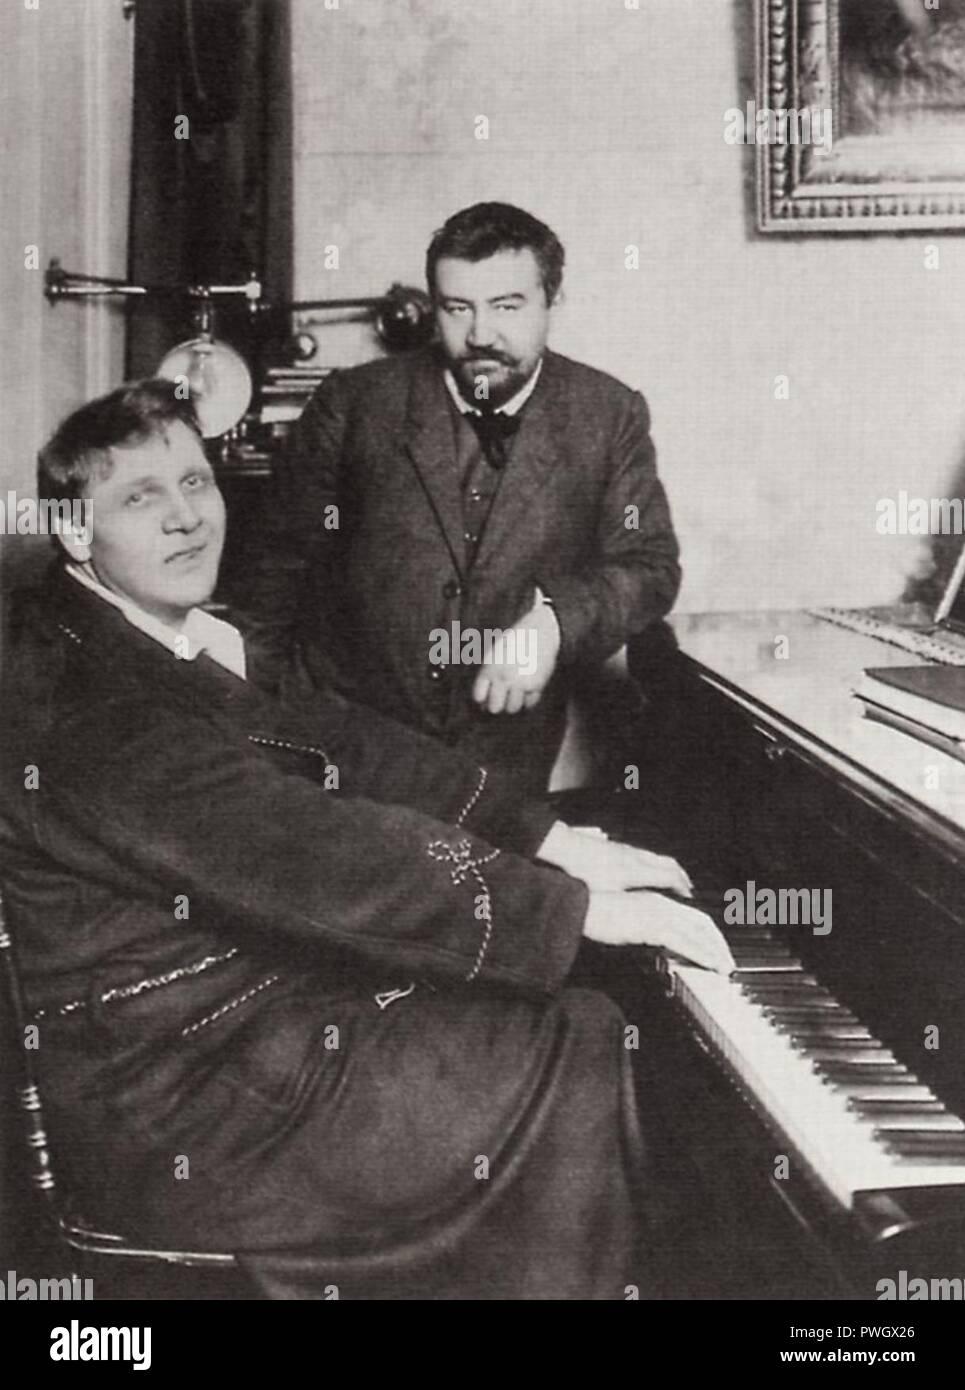 Bulla, Karl Karlovič - Šaljapin am eigenen Klavier, mit Alexander Ivanovič Kuprin, St. Petersburg - Stock Image